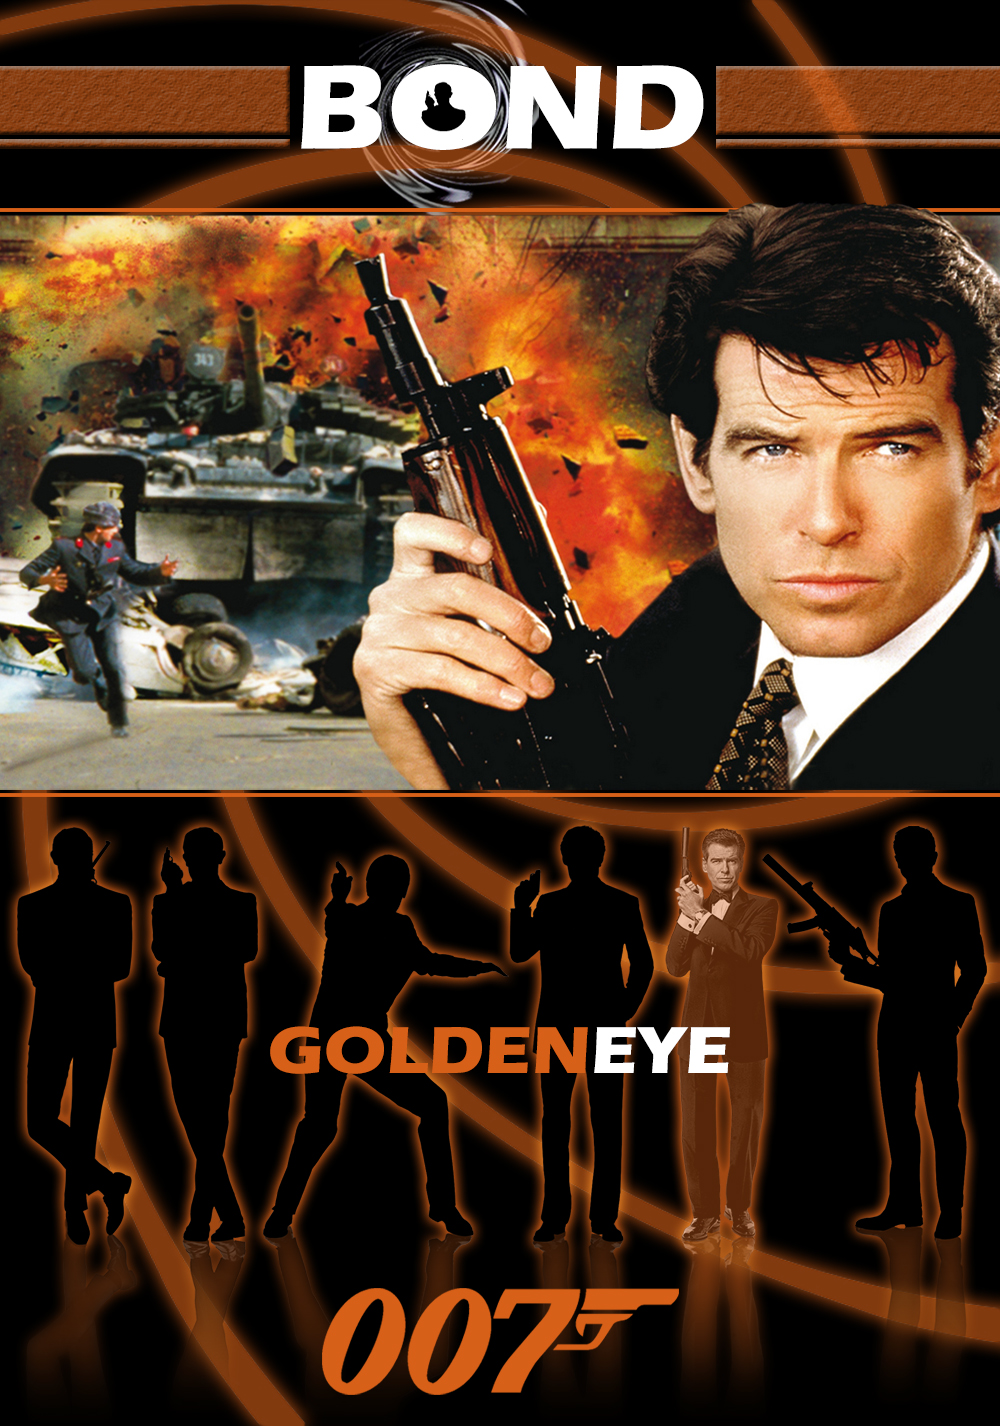 Goldeneye movie poster imageGoldeneye Movie Poster